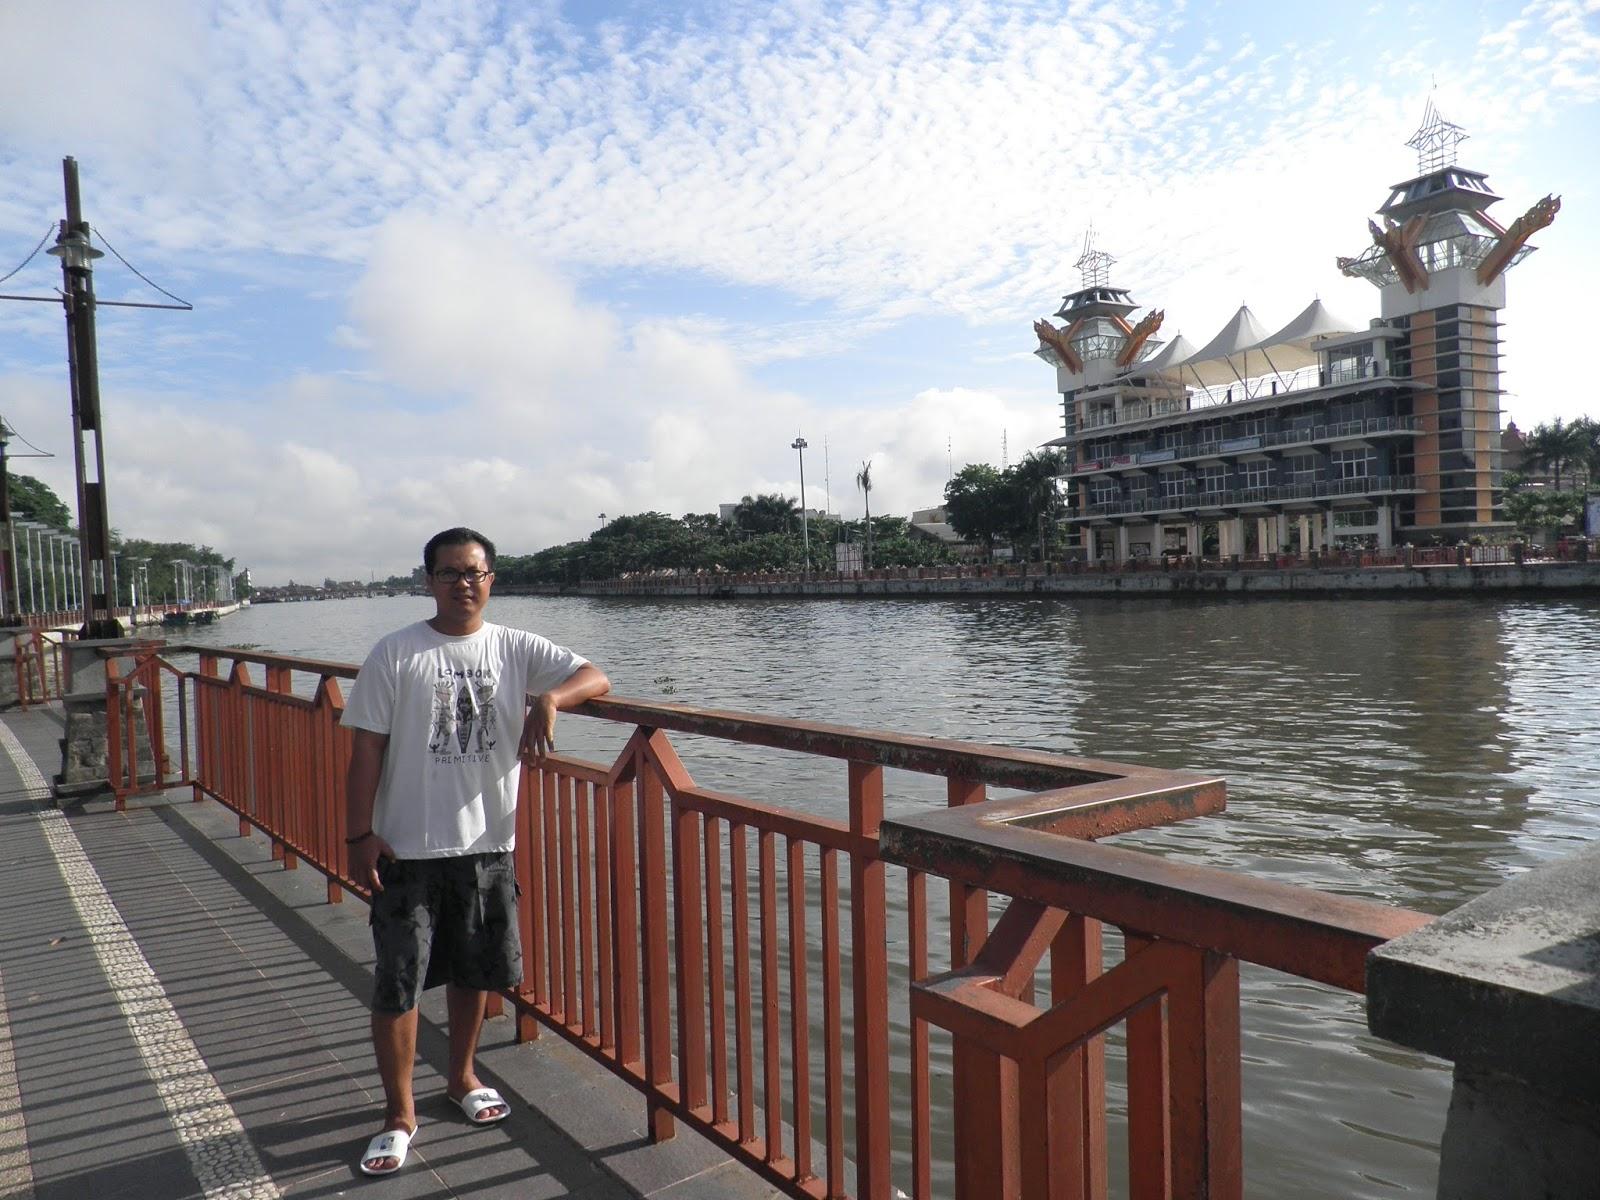 Wiyak Bumi Langit Banjarmasin Wisata Sungai Melengkapi Menara Pandang Taman